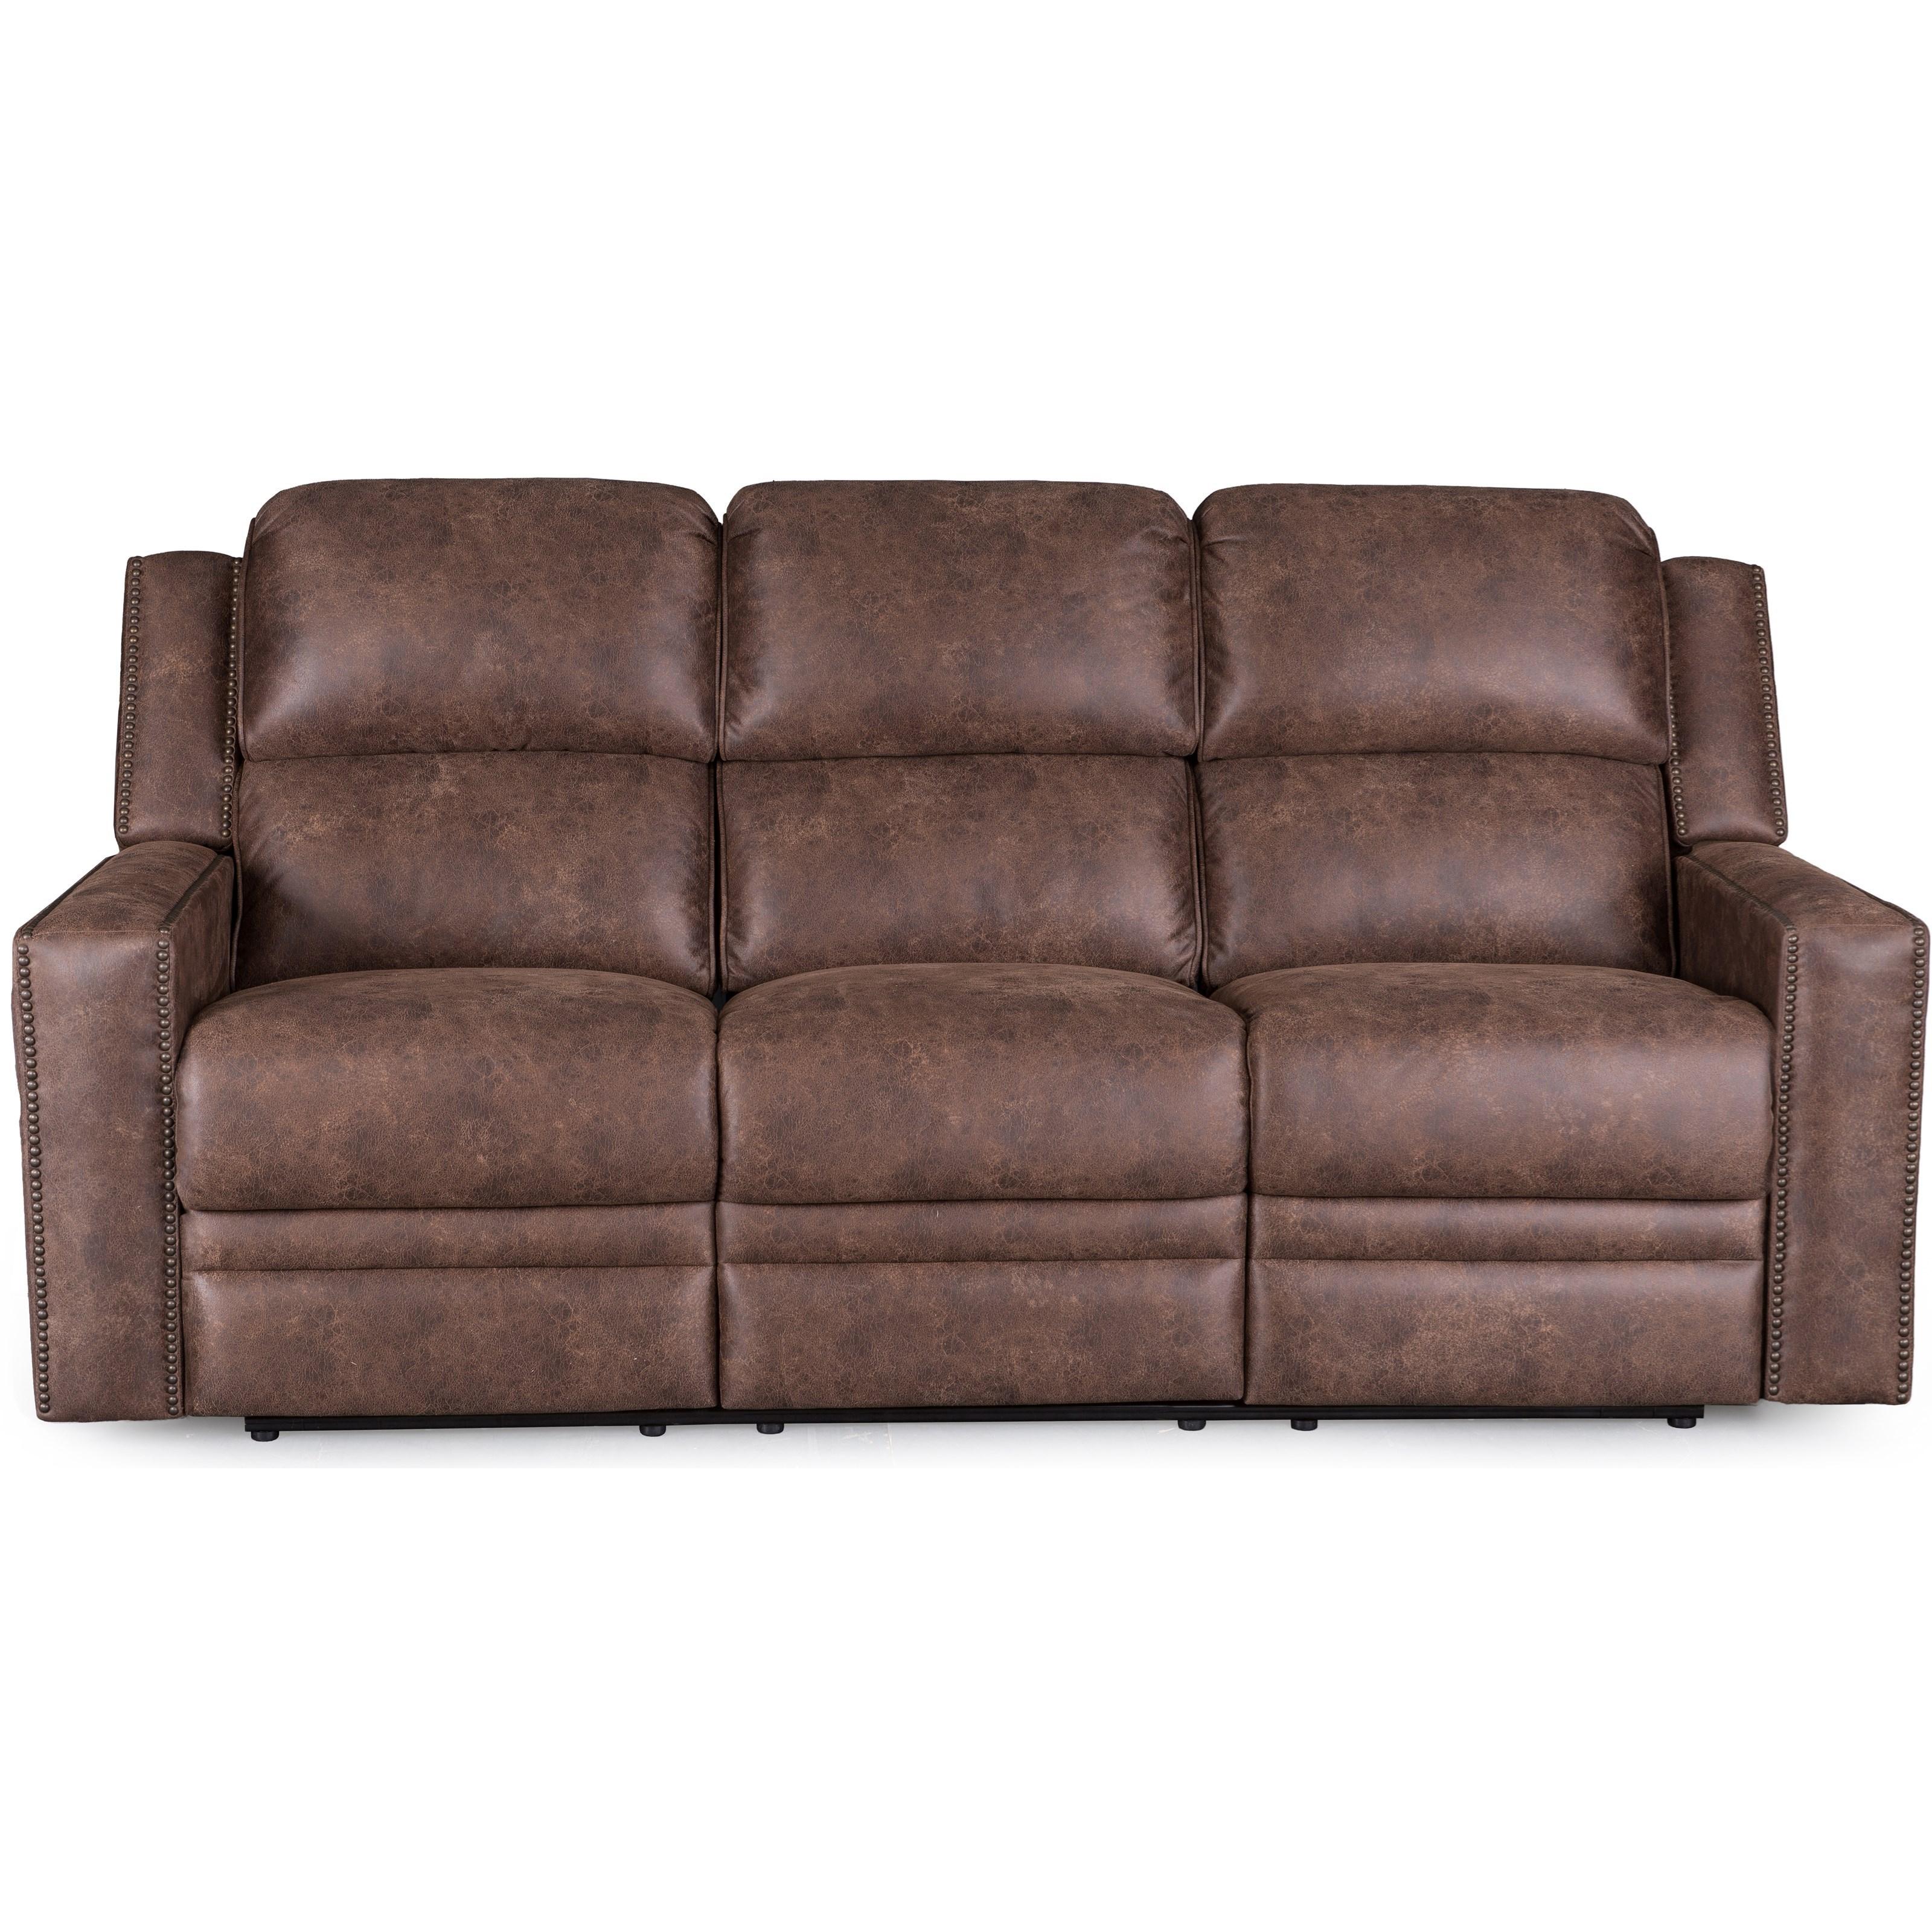 Synergy Home Furnishings 1340 Sofa with Power Headrest - Item Number: 1340-52PHR-PasadenaElk